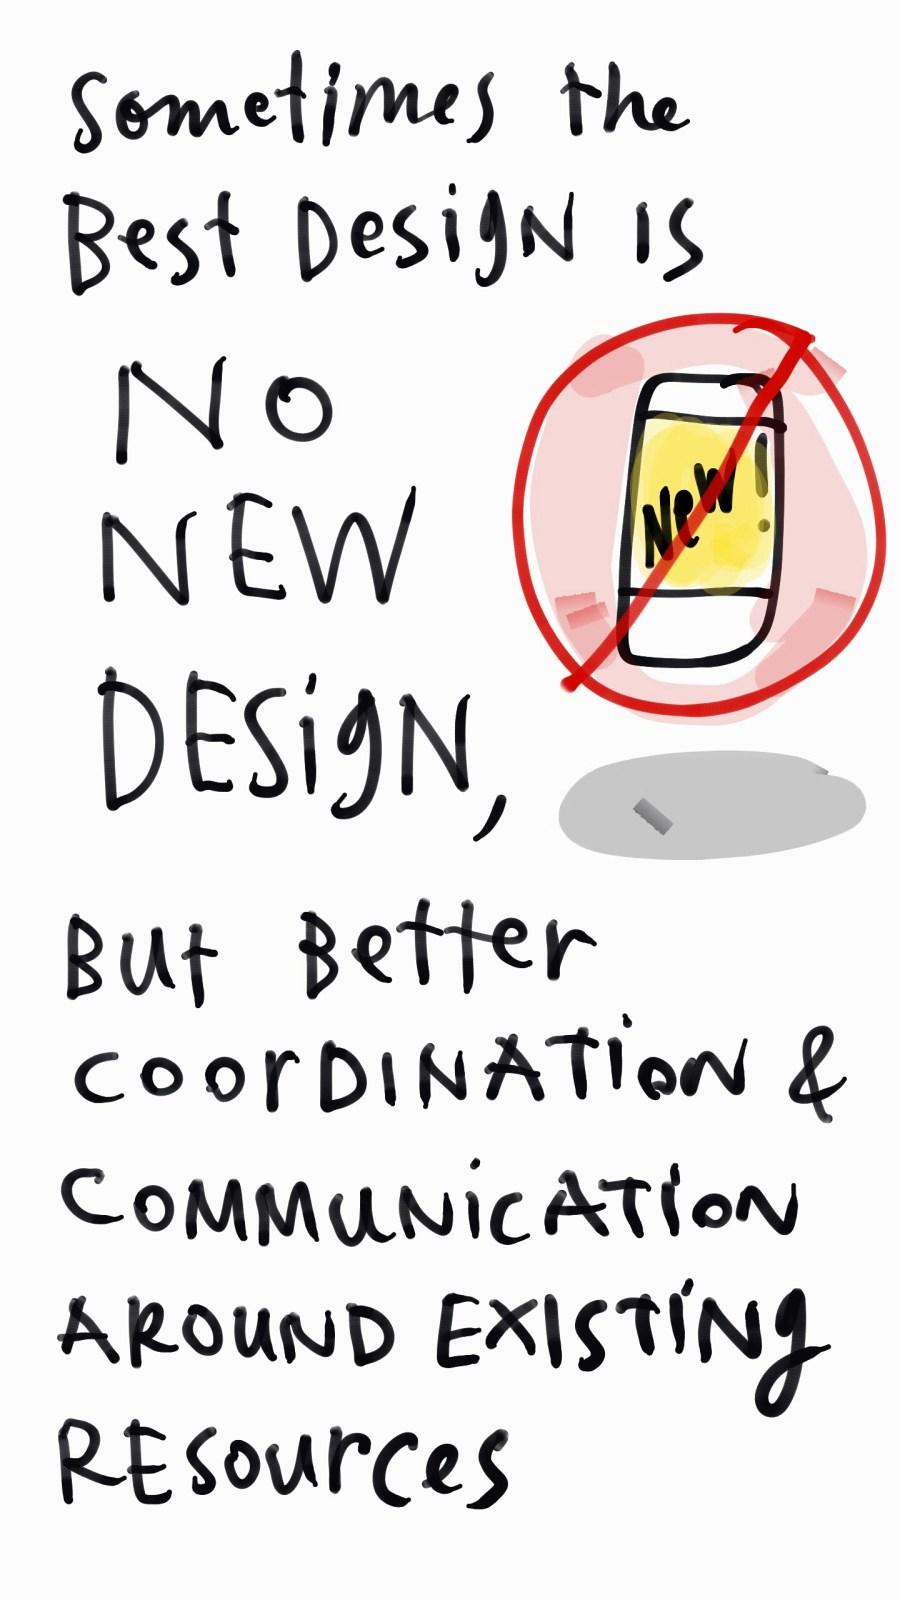 The Best Design is No New Design